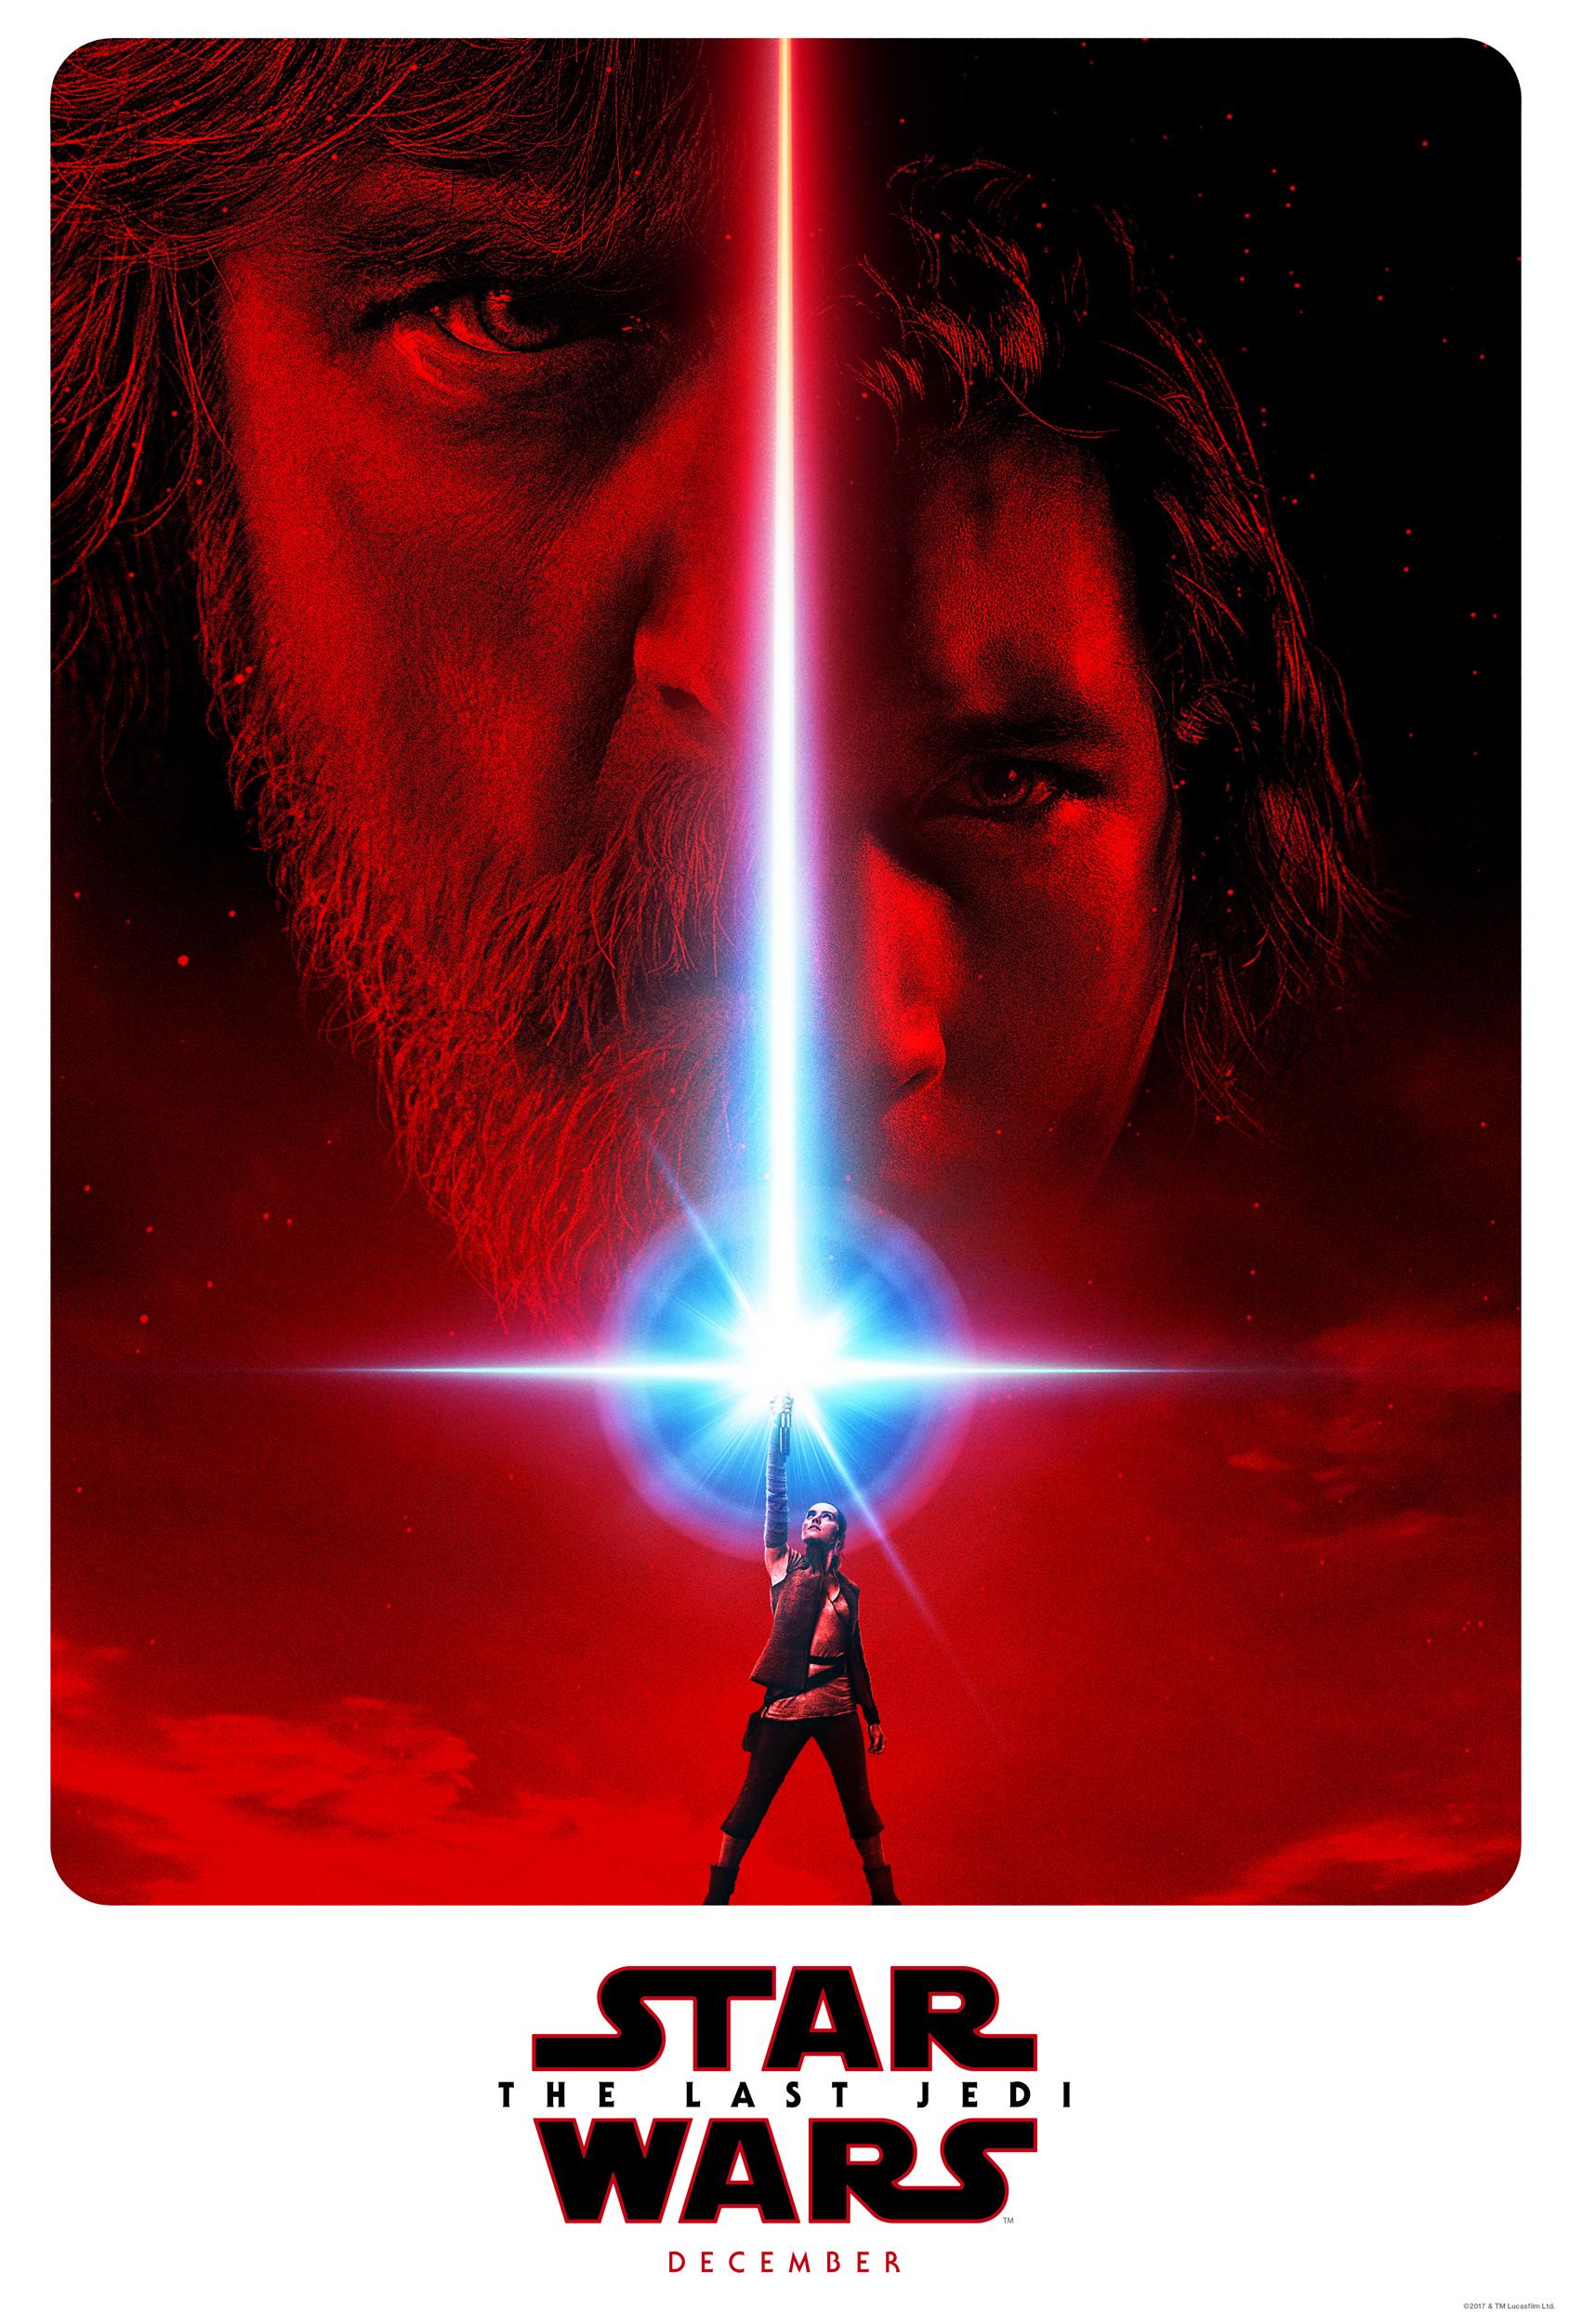 The_Last_Jedi_poster.jpg